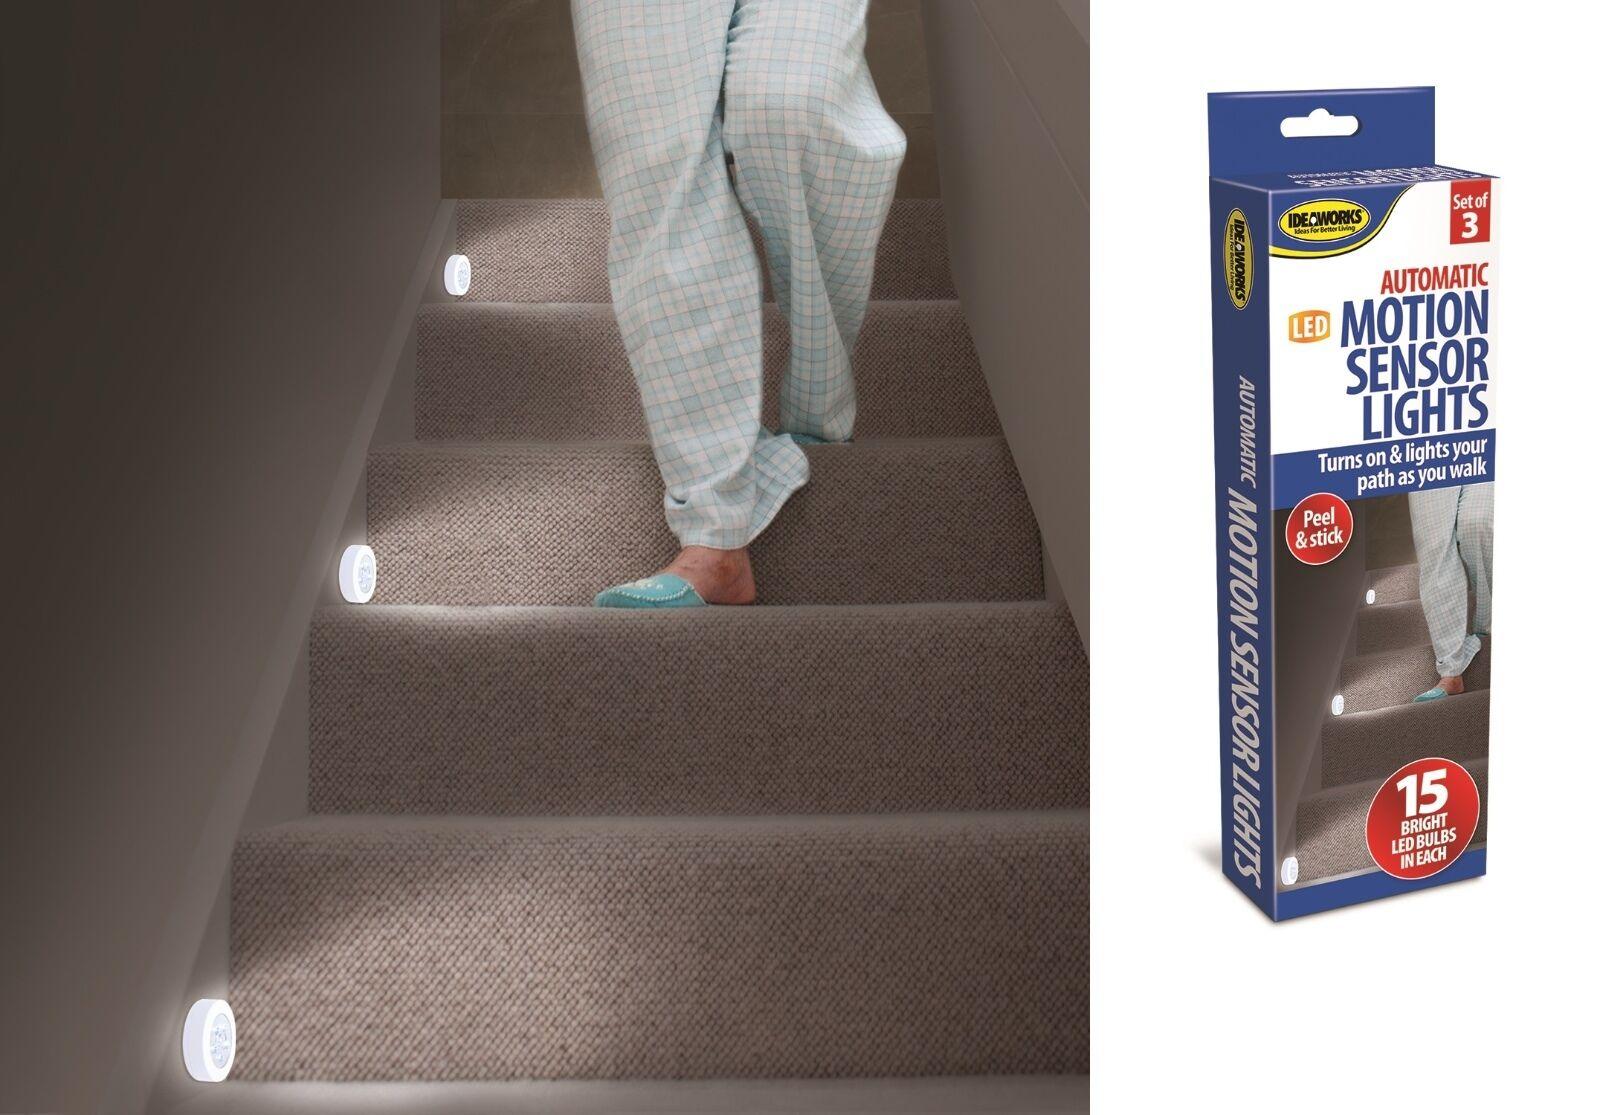 Stair Lights Set Of 3 Motion Sensor Stair Lights Or Hallway Lighting Night  Light